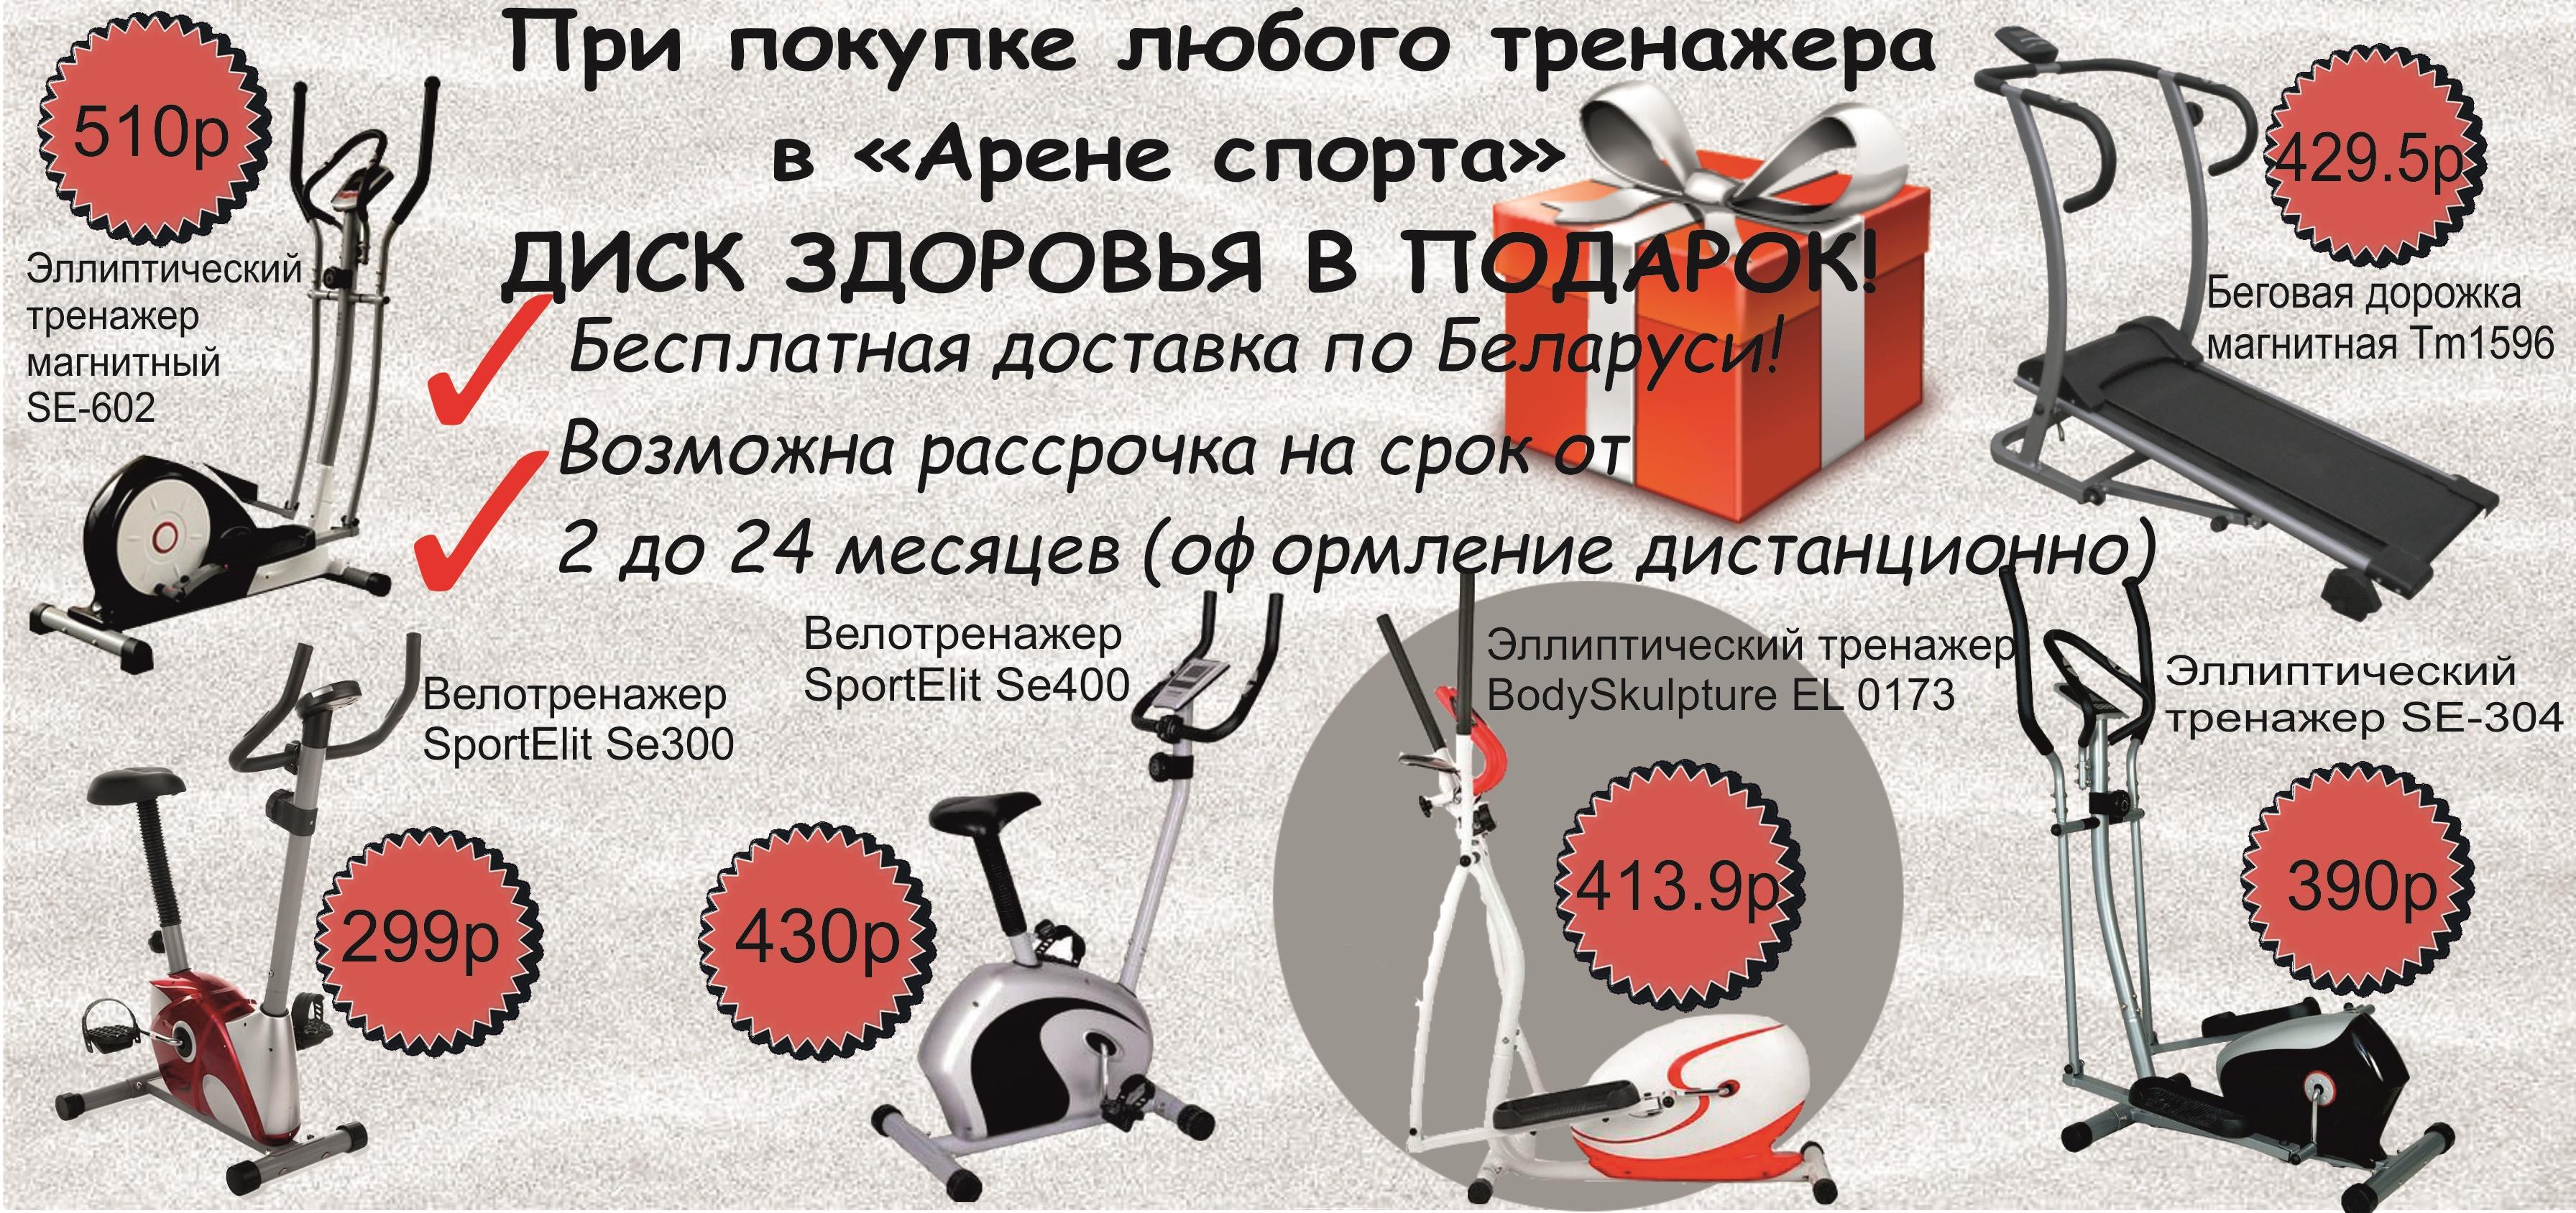 http://arena-sporta.by/catalog/trenazhery